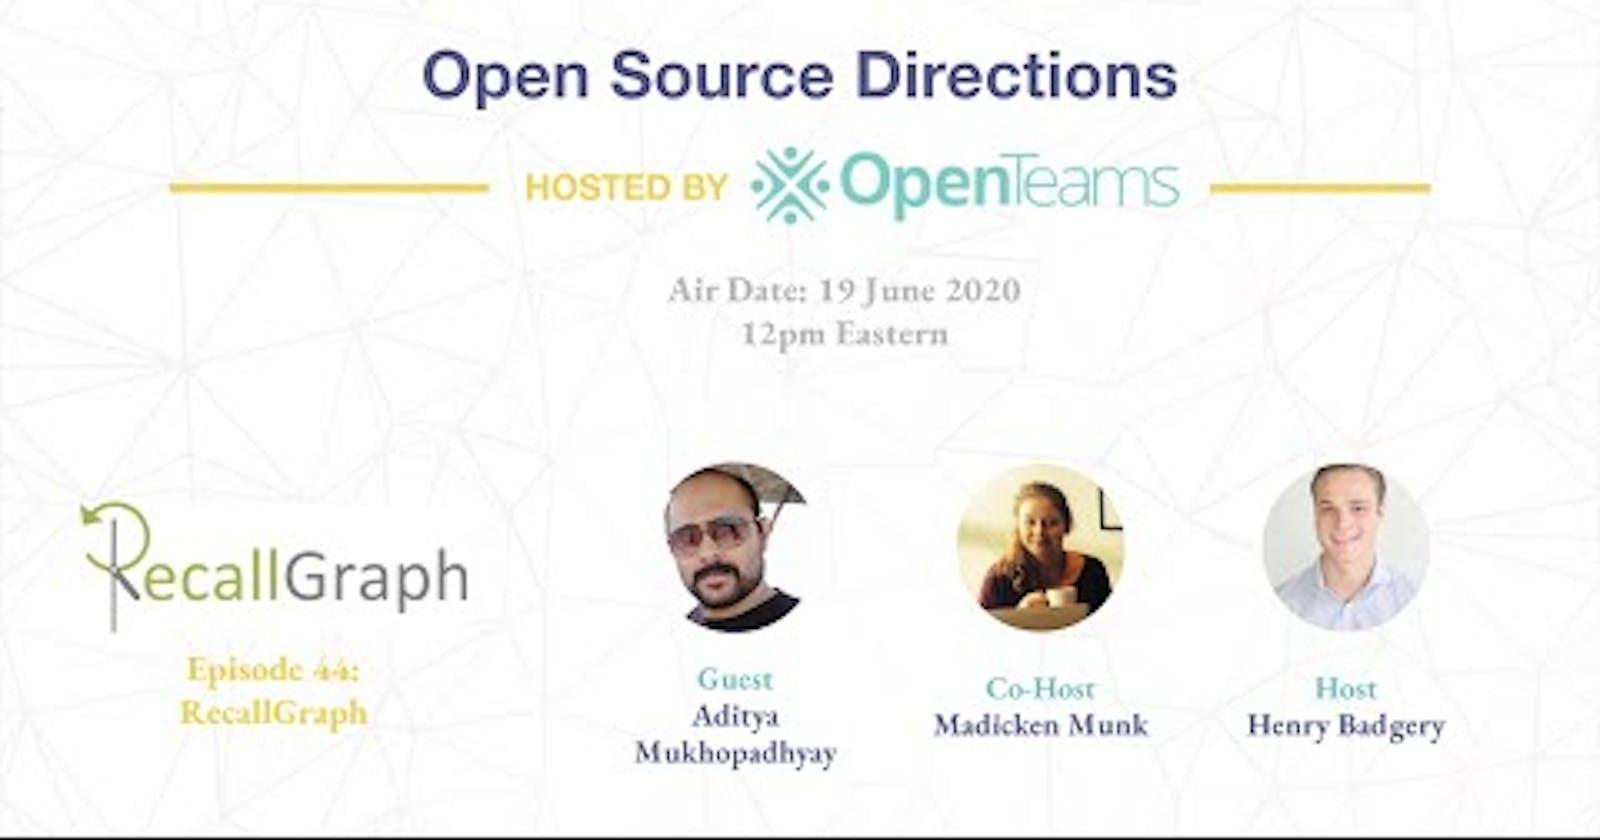 RecallGraph Presented @ Open Source Directions